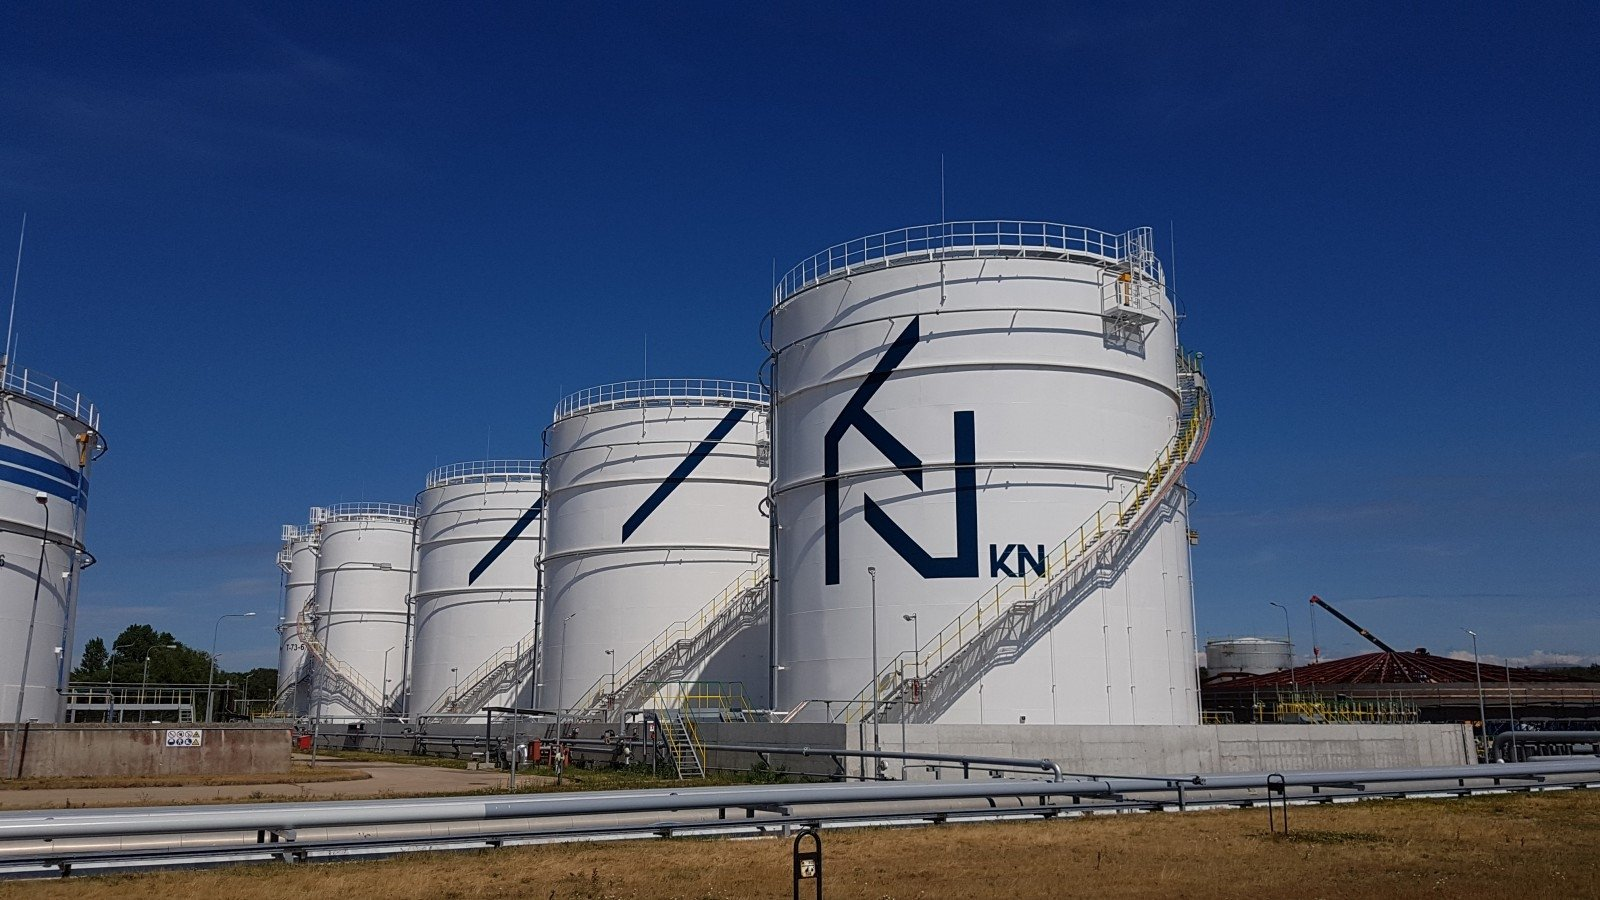 Klaipedos nafta уступила акции владеющей судном Kairos компании Nauticor